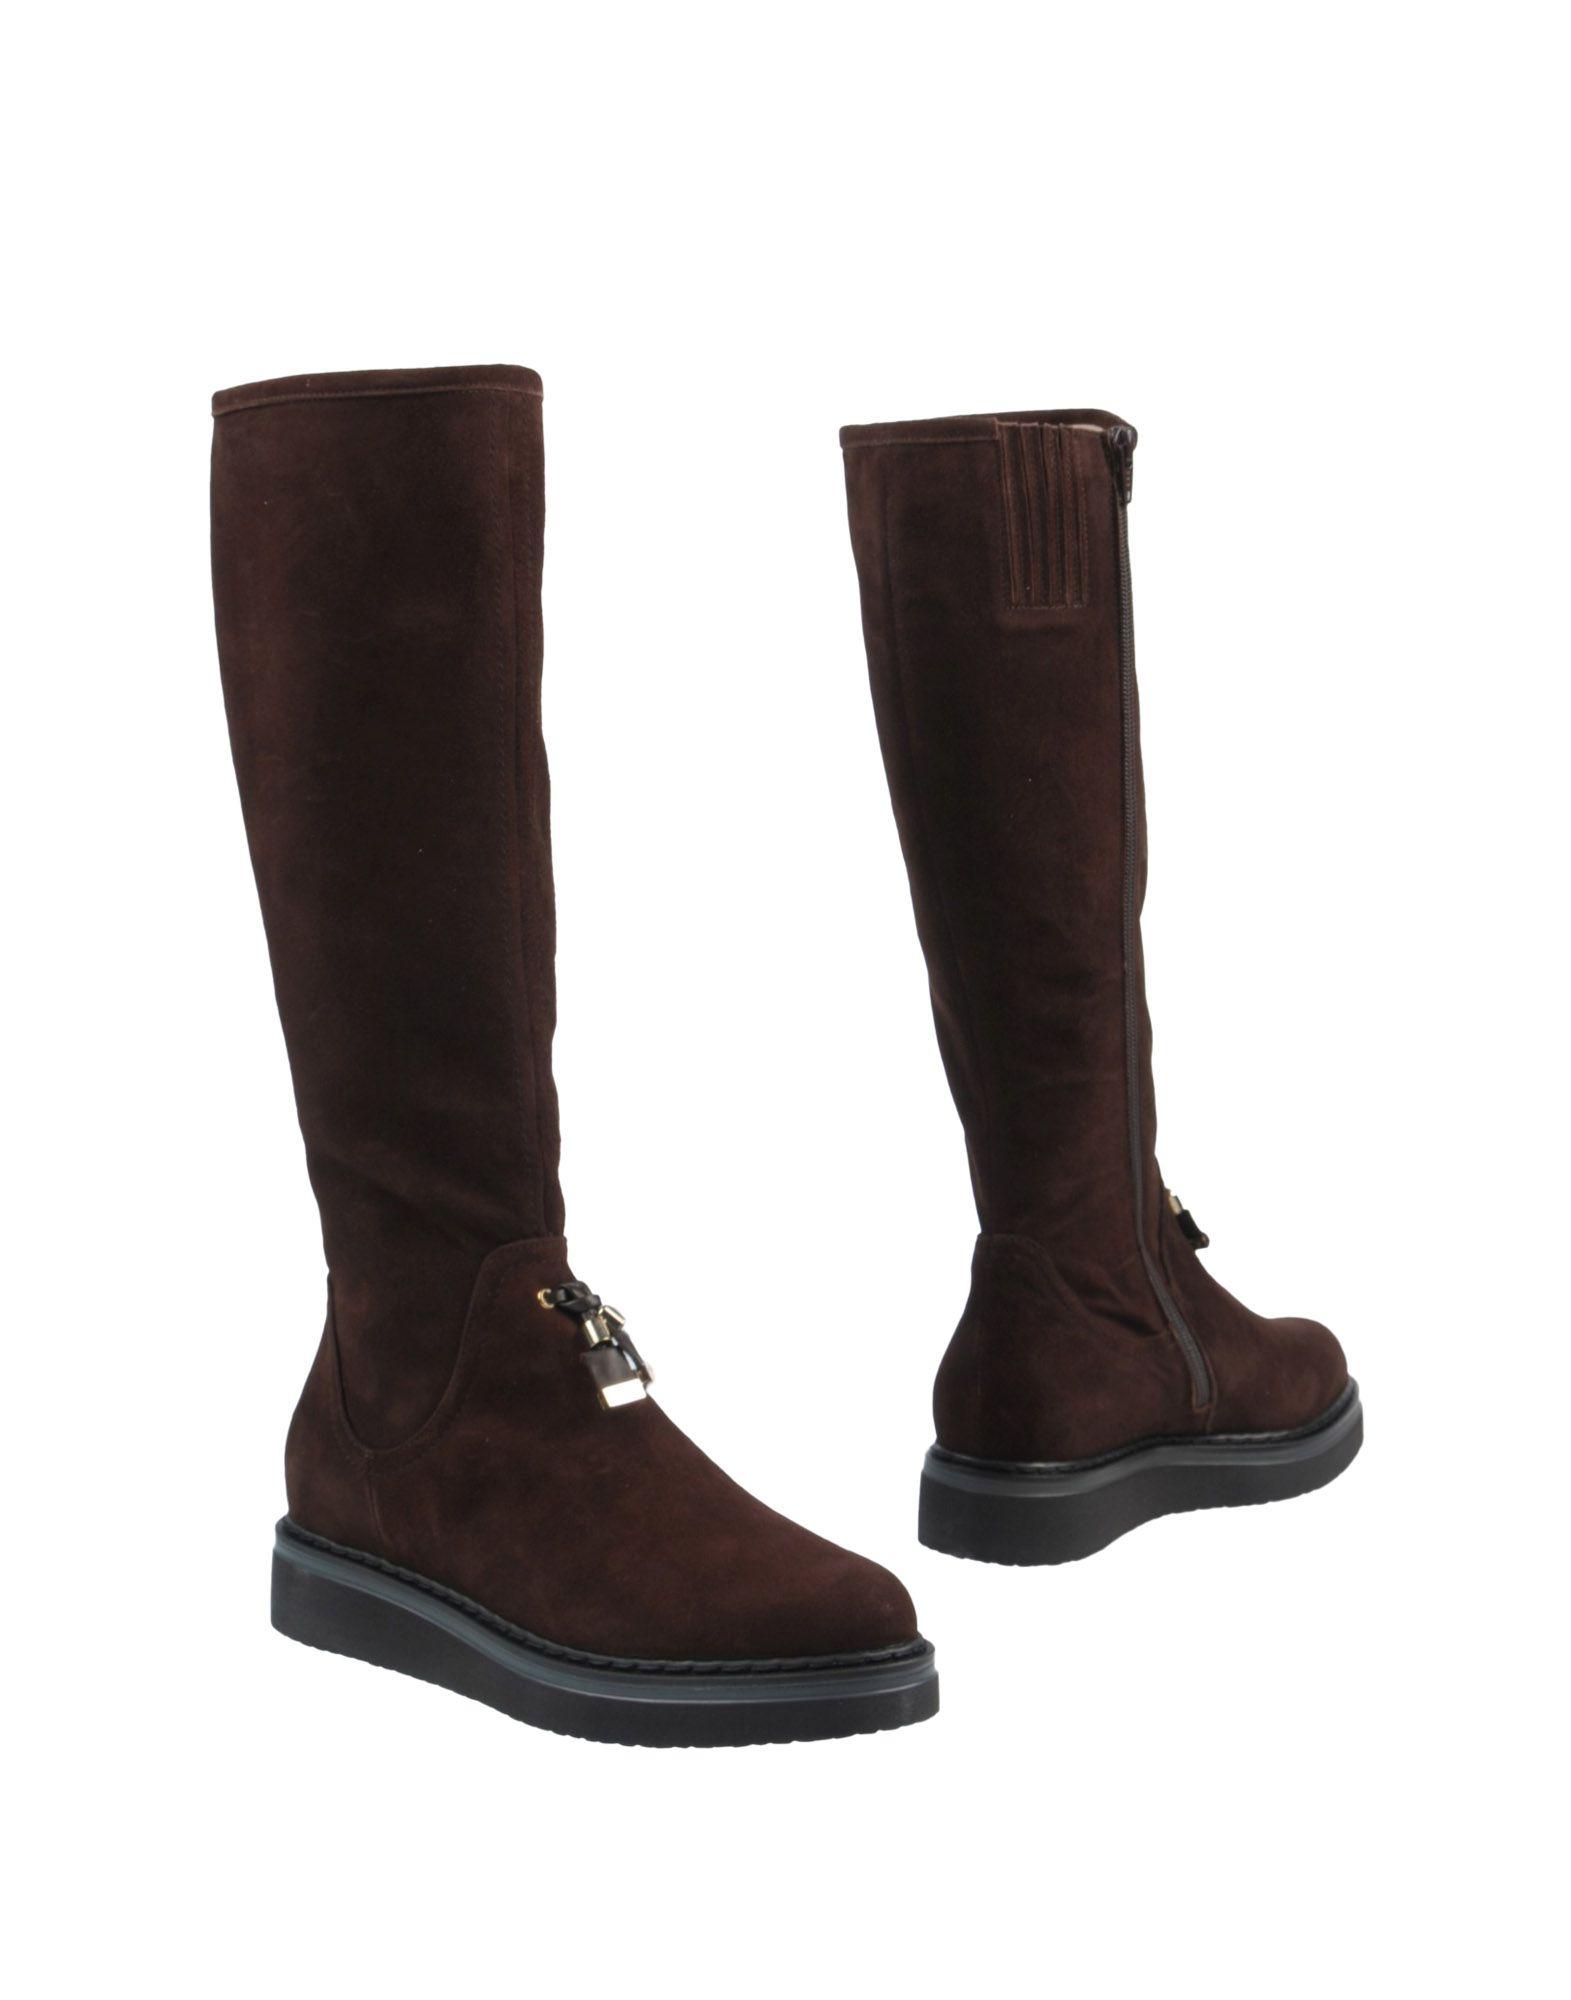 Norma Norma Norma J.Baker Stiefel Damen  11447318PUGünstige gut aussehende Schuhe 3ff900